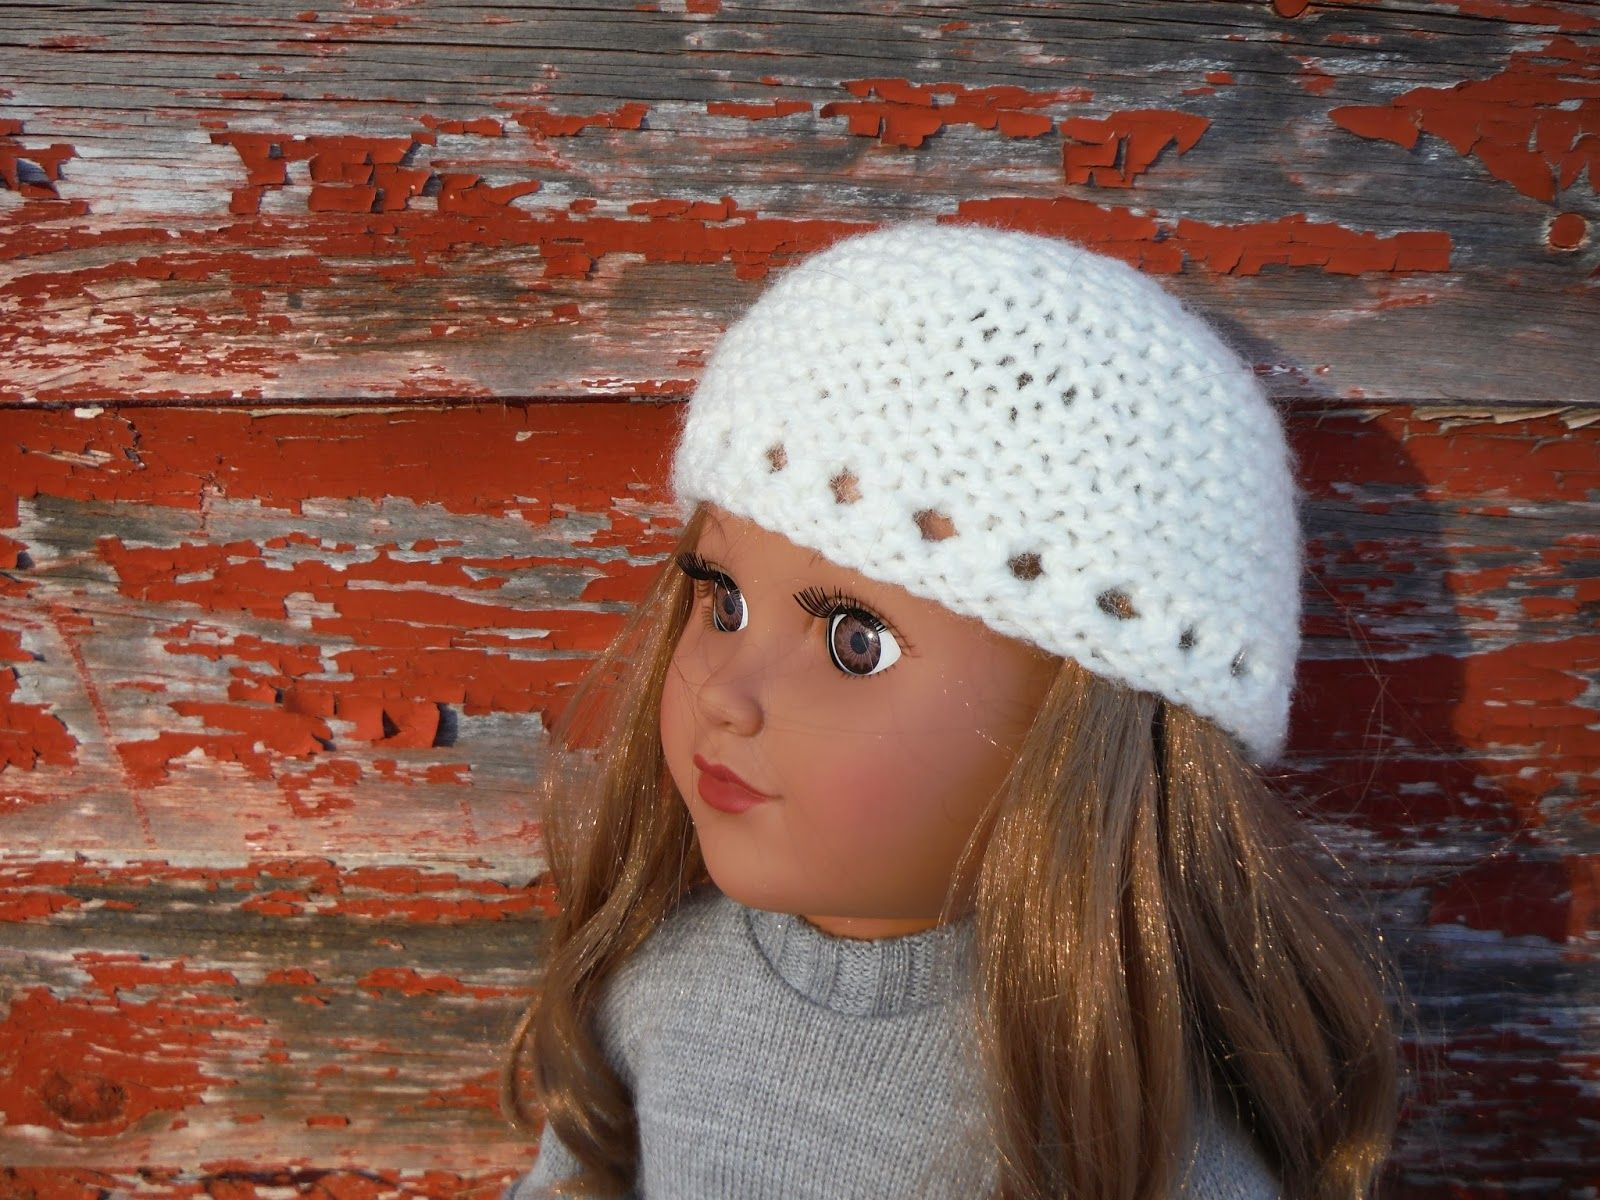 Free knitting pattern garter stitch hat for 18 american girl free knitting pattern garter stitch hat for 18 american girl doll bankloansurffo Gallery